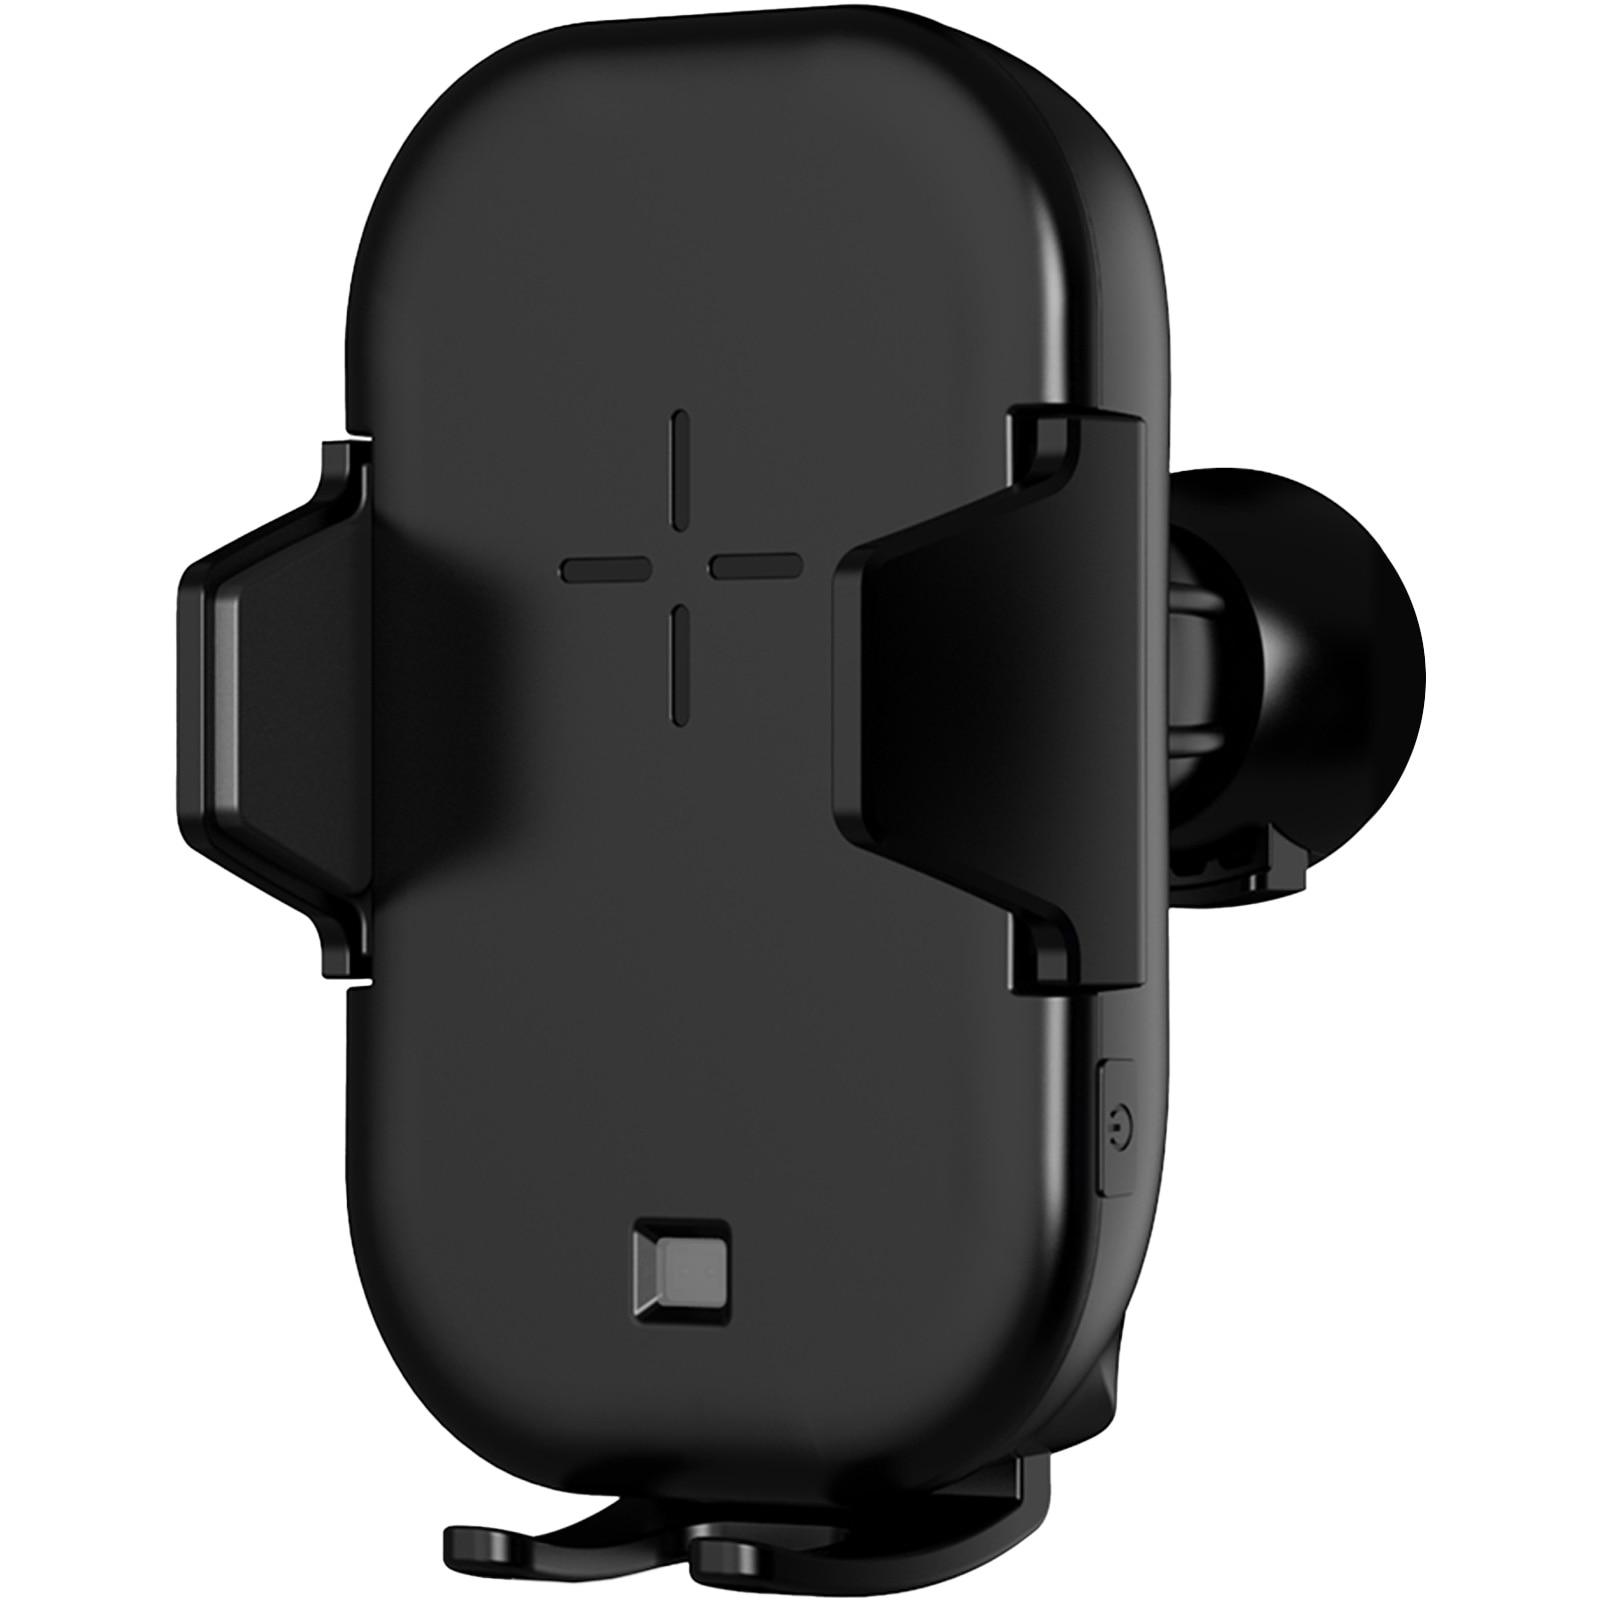 15W Wireless Qi Car Charger Black